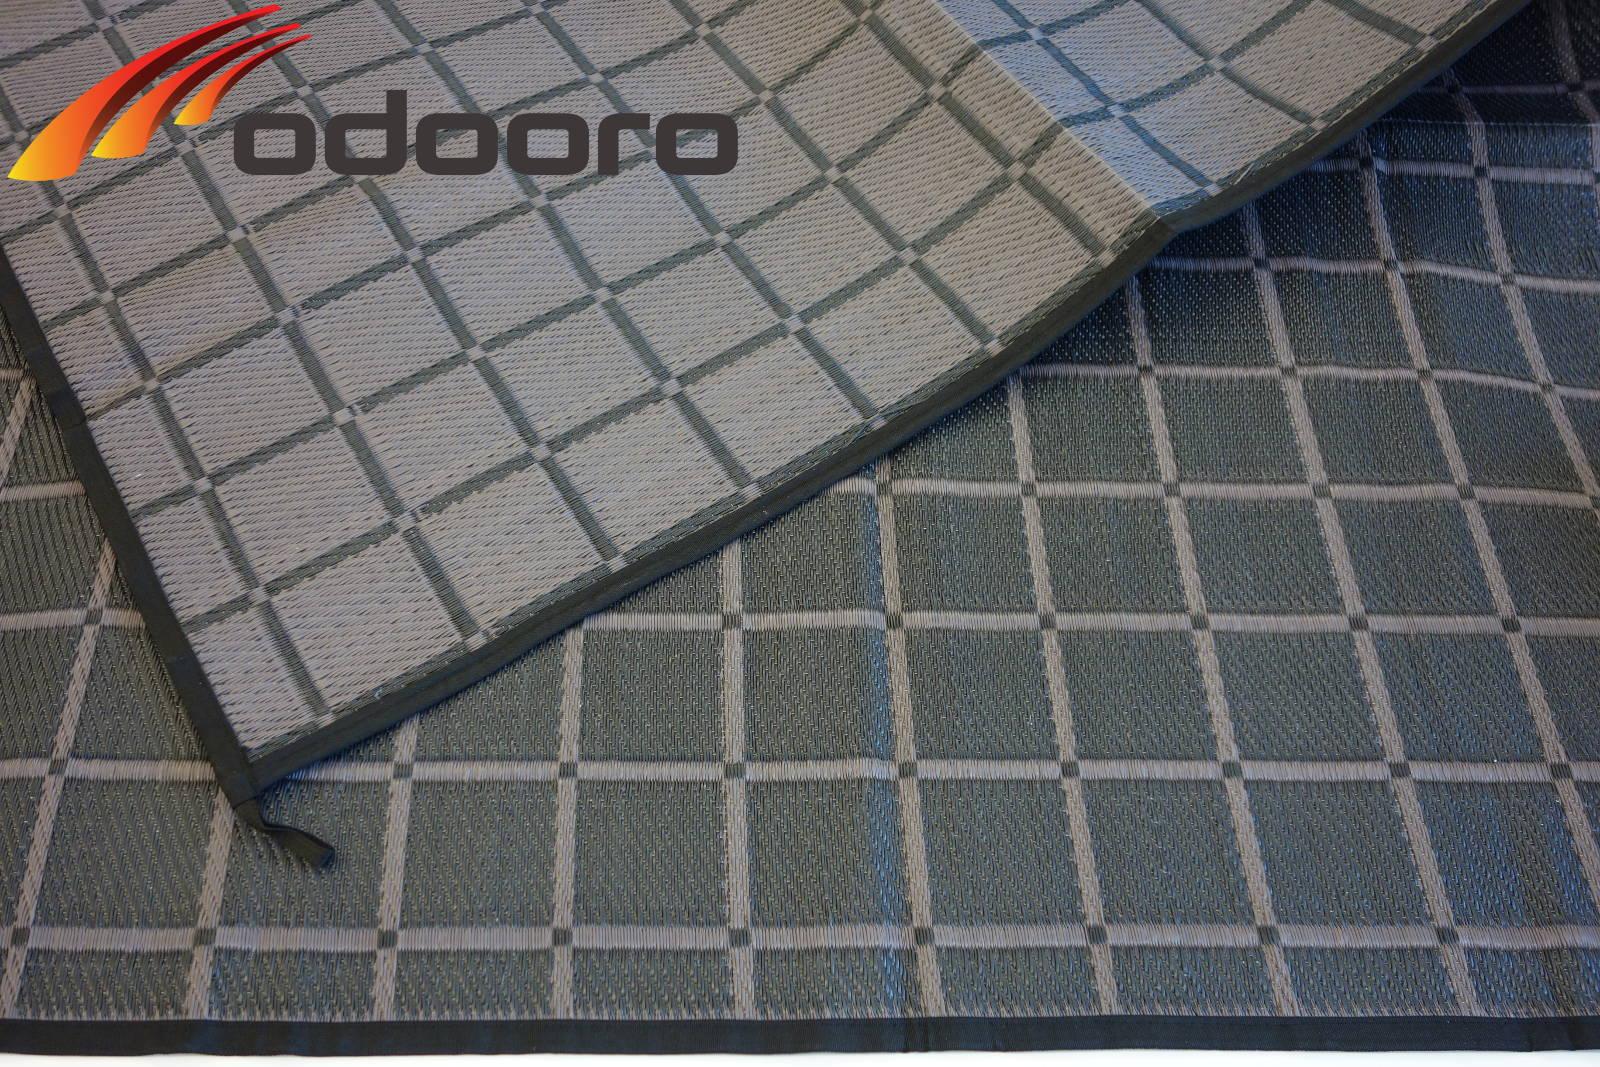 zeltteppich wavetex gro e auswahl vorzeltteppich. Black Bedroom Furniture Sets. Home Design Ideas